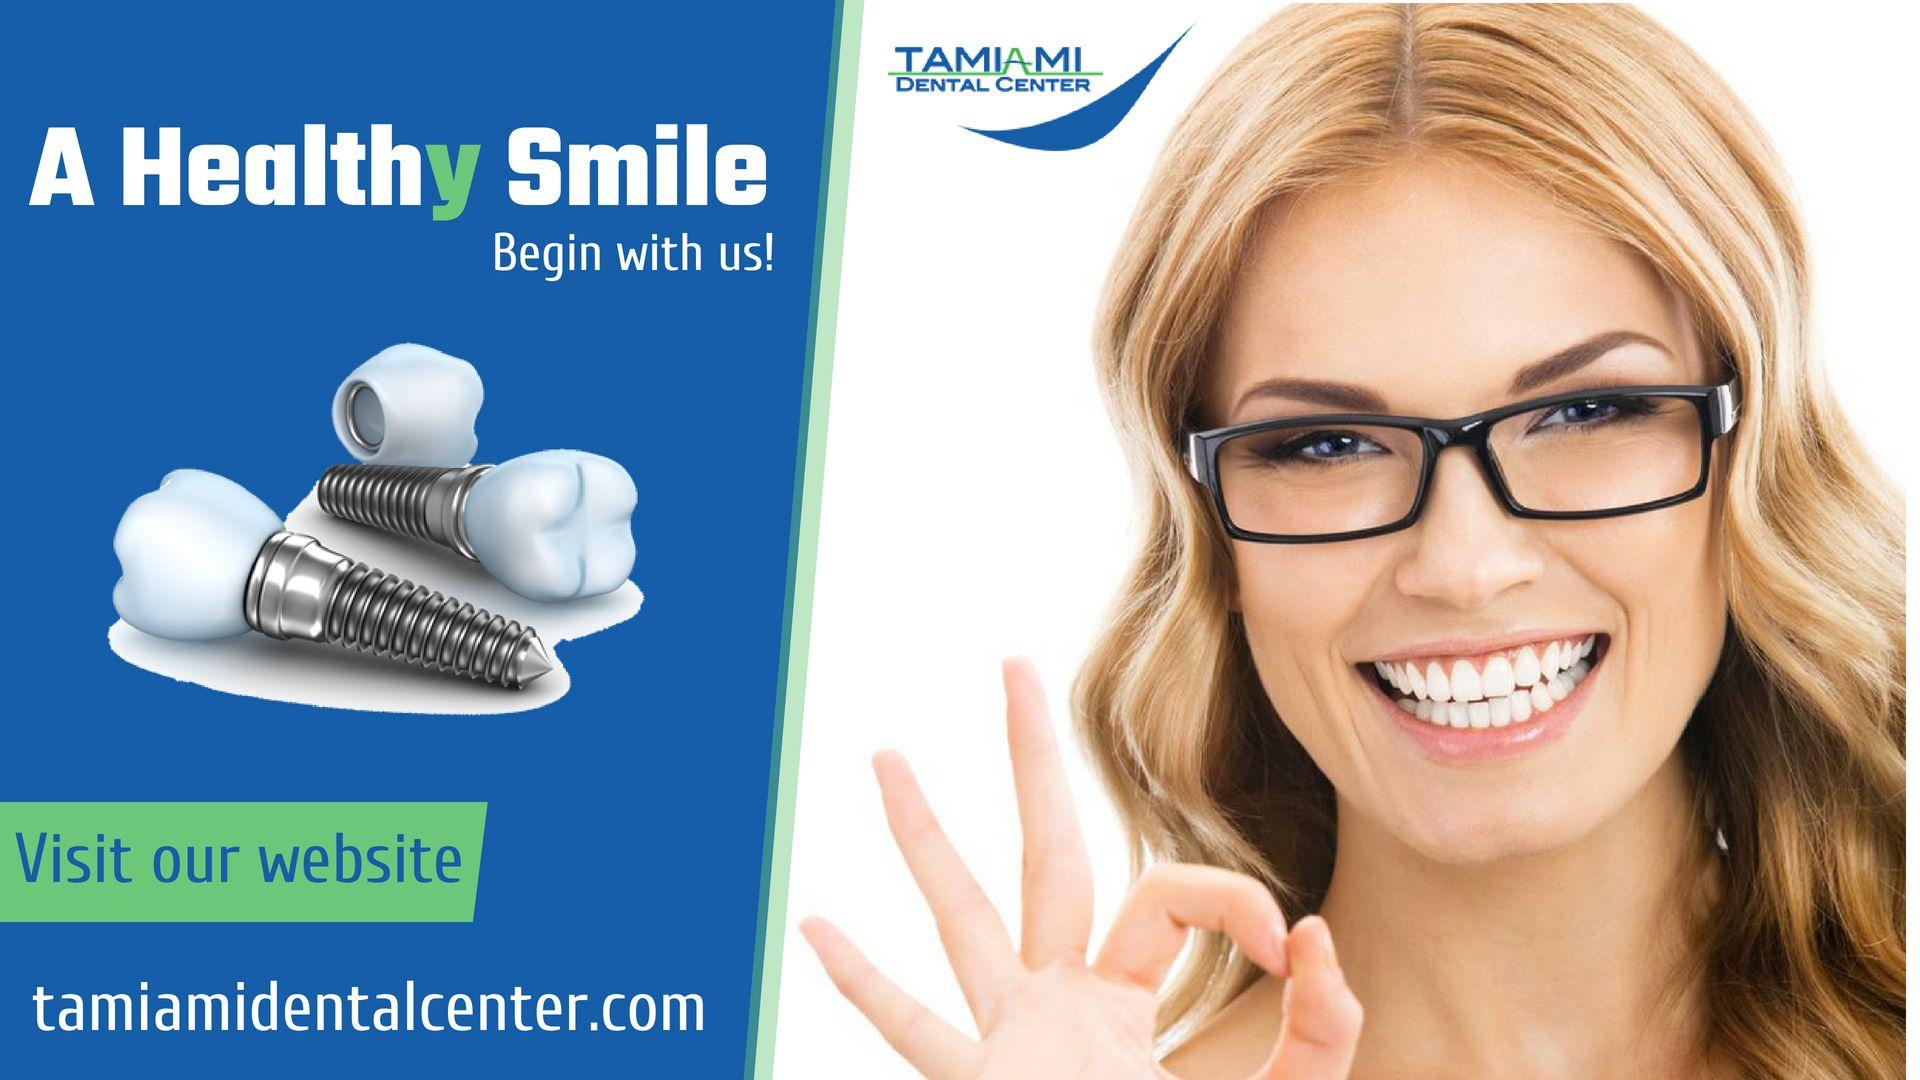 Affordable dental care for your family dental